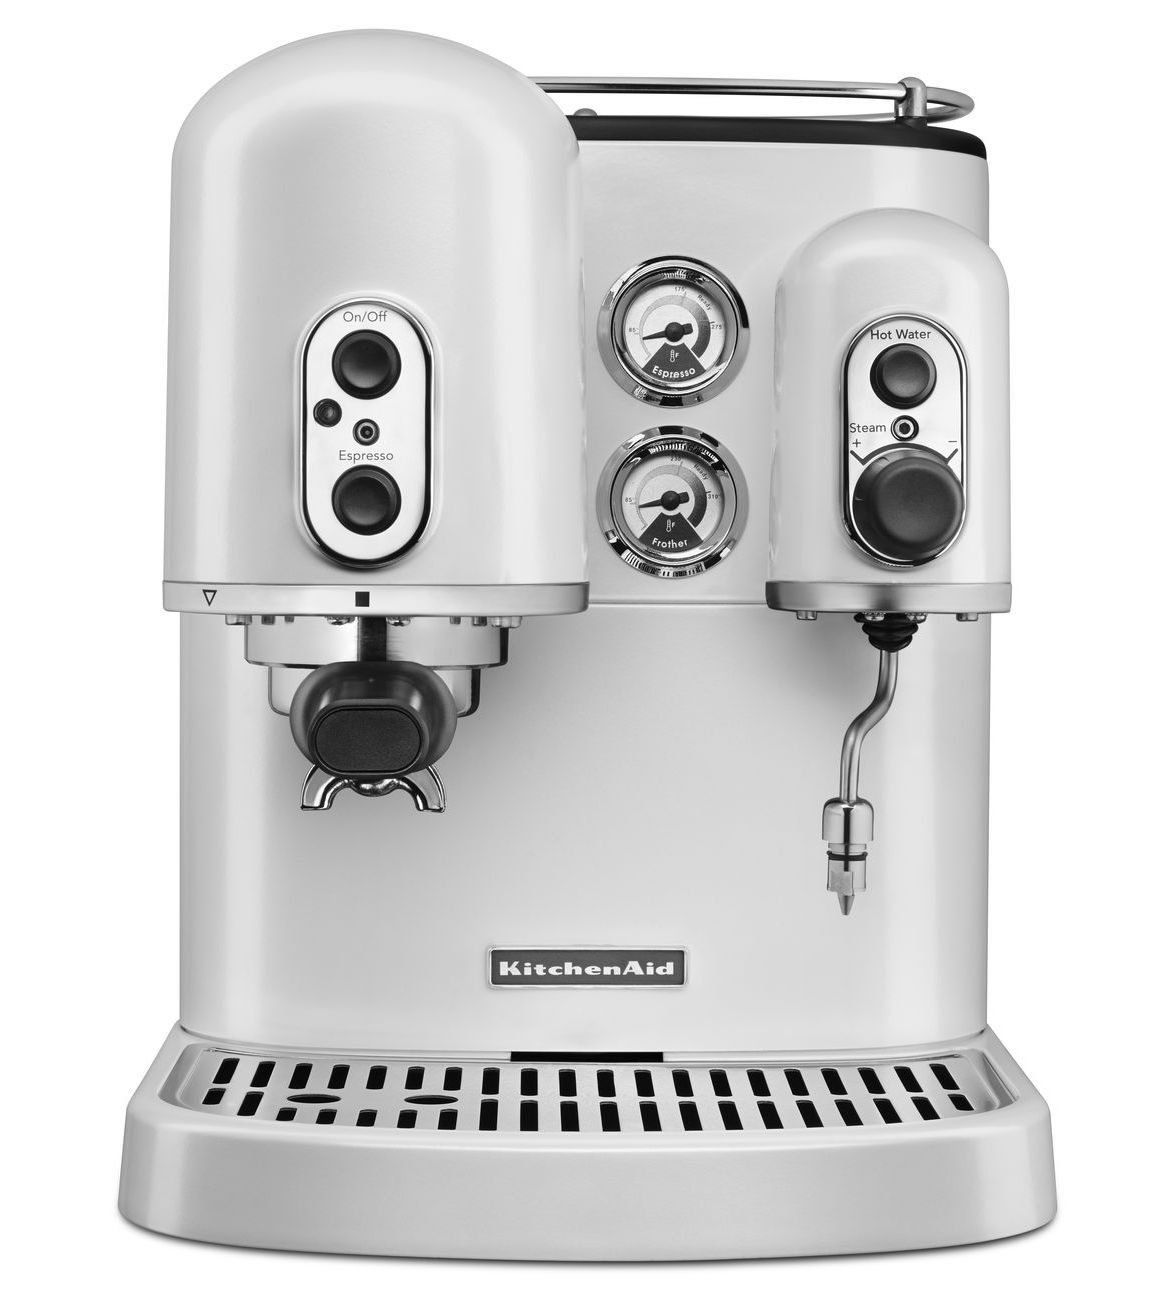 KitchenAid Dual Boiler Manual Espresso Maker